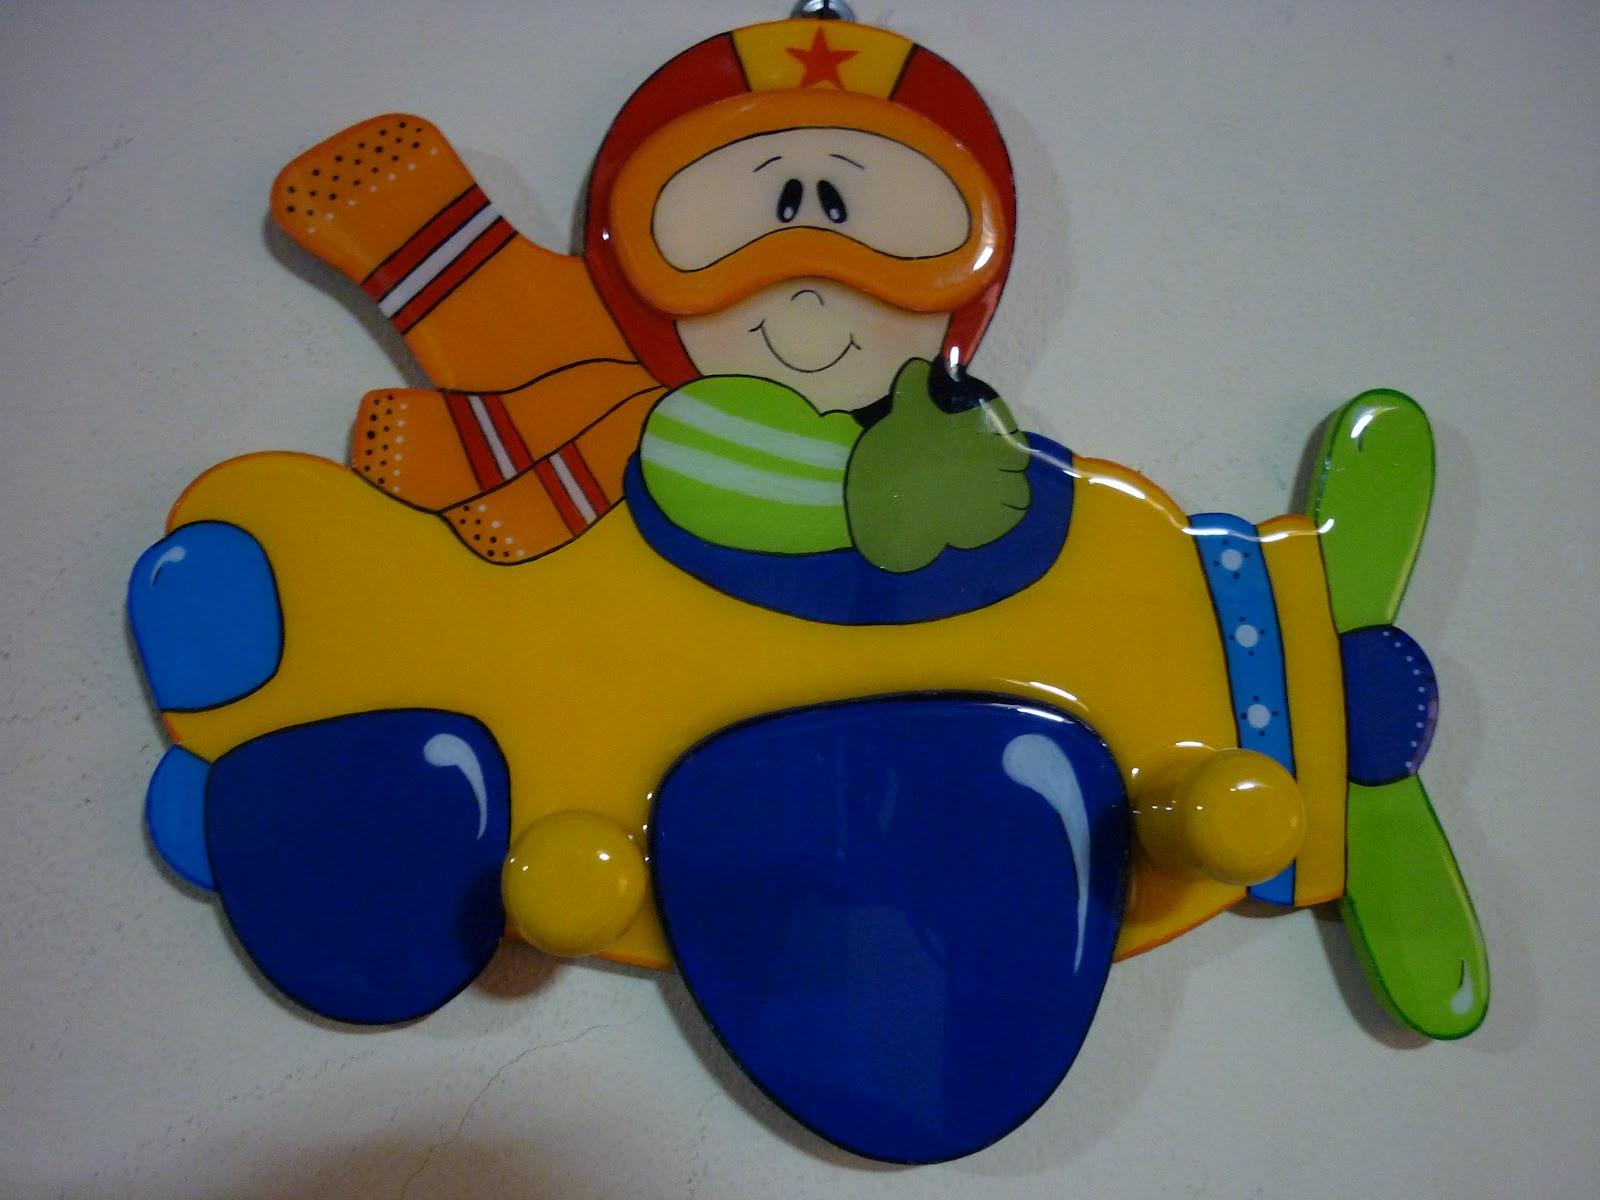 Manualidades decomagic art percheros infantiles - Percheros pared infantiles ...